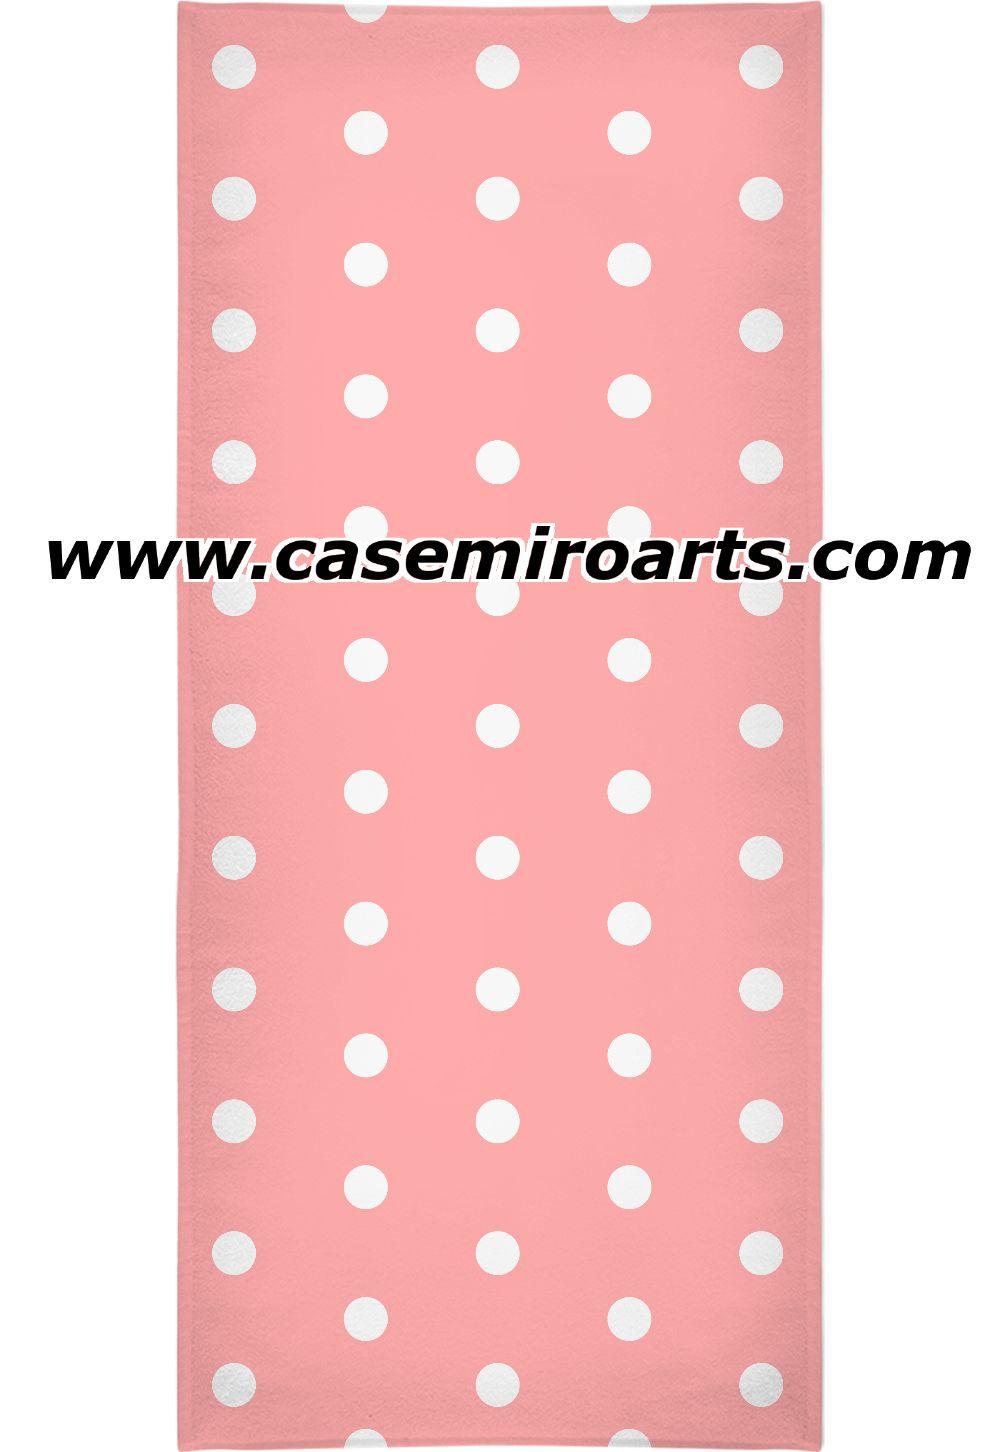 Retro Style Beach Bath Towel Salmon Pink And White Polka Dot